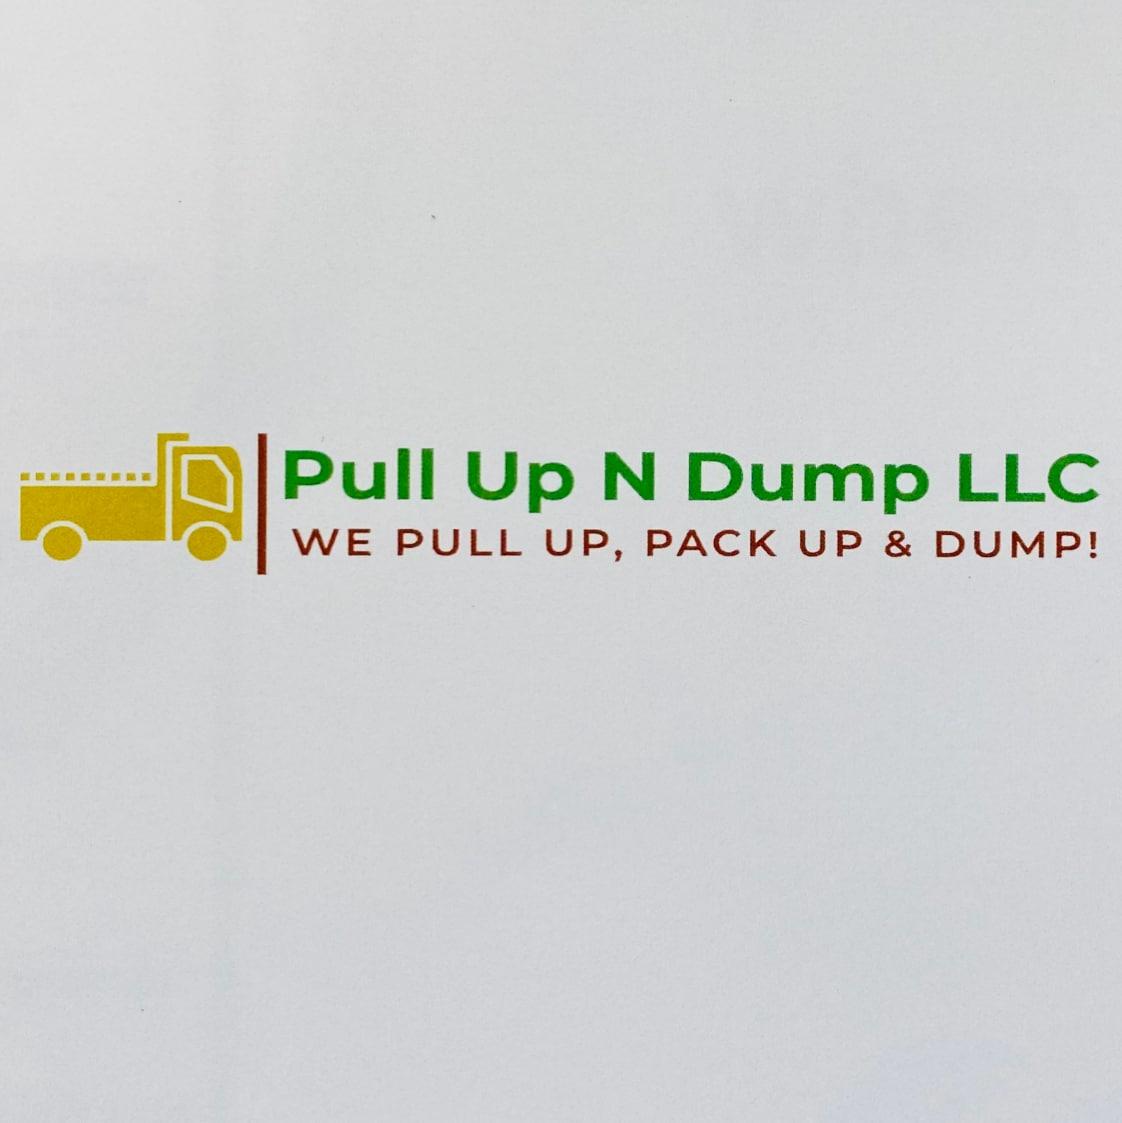 Pull Up N Dump LLC logo